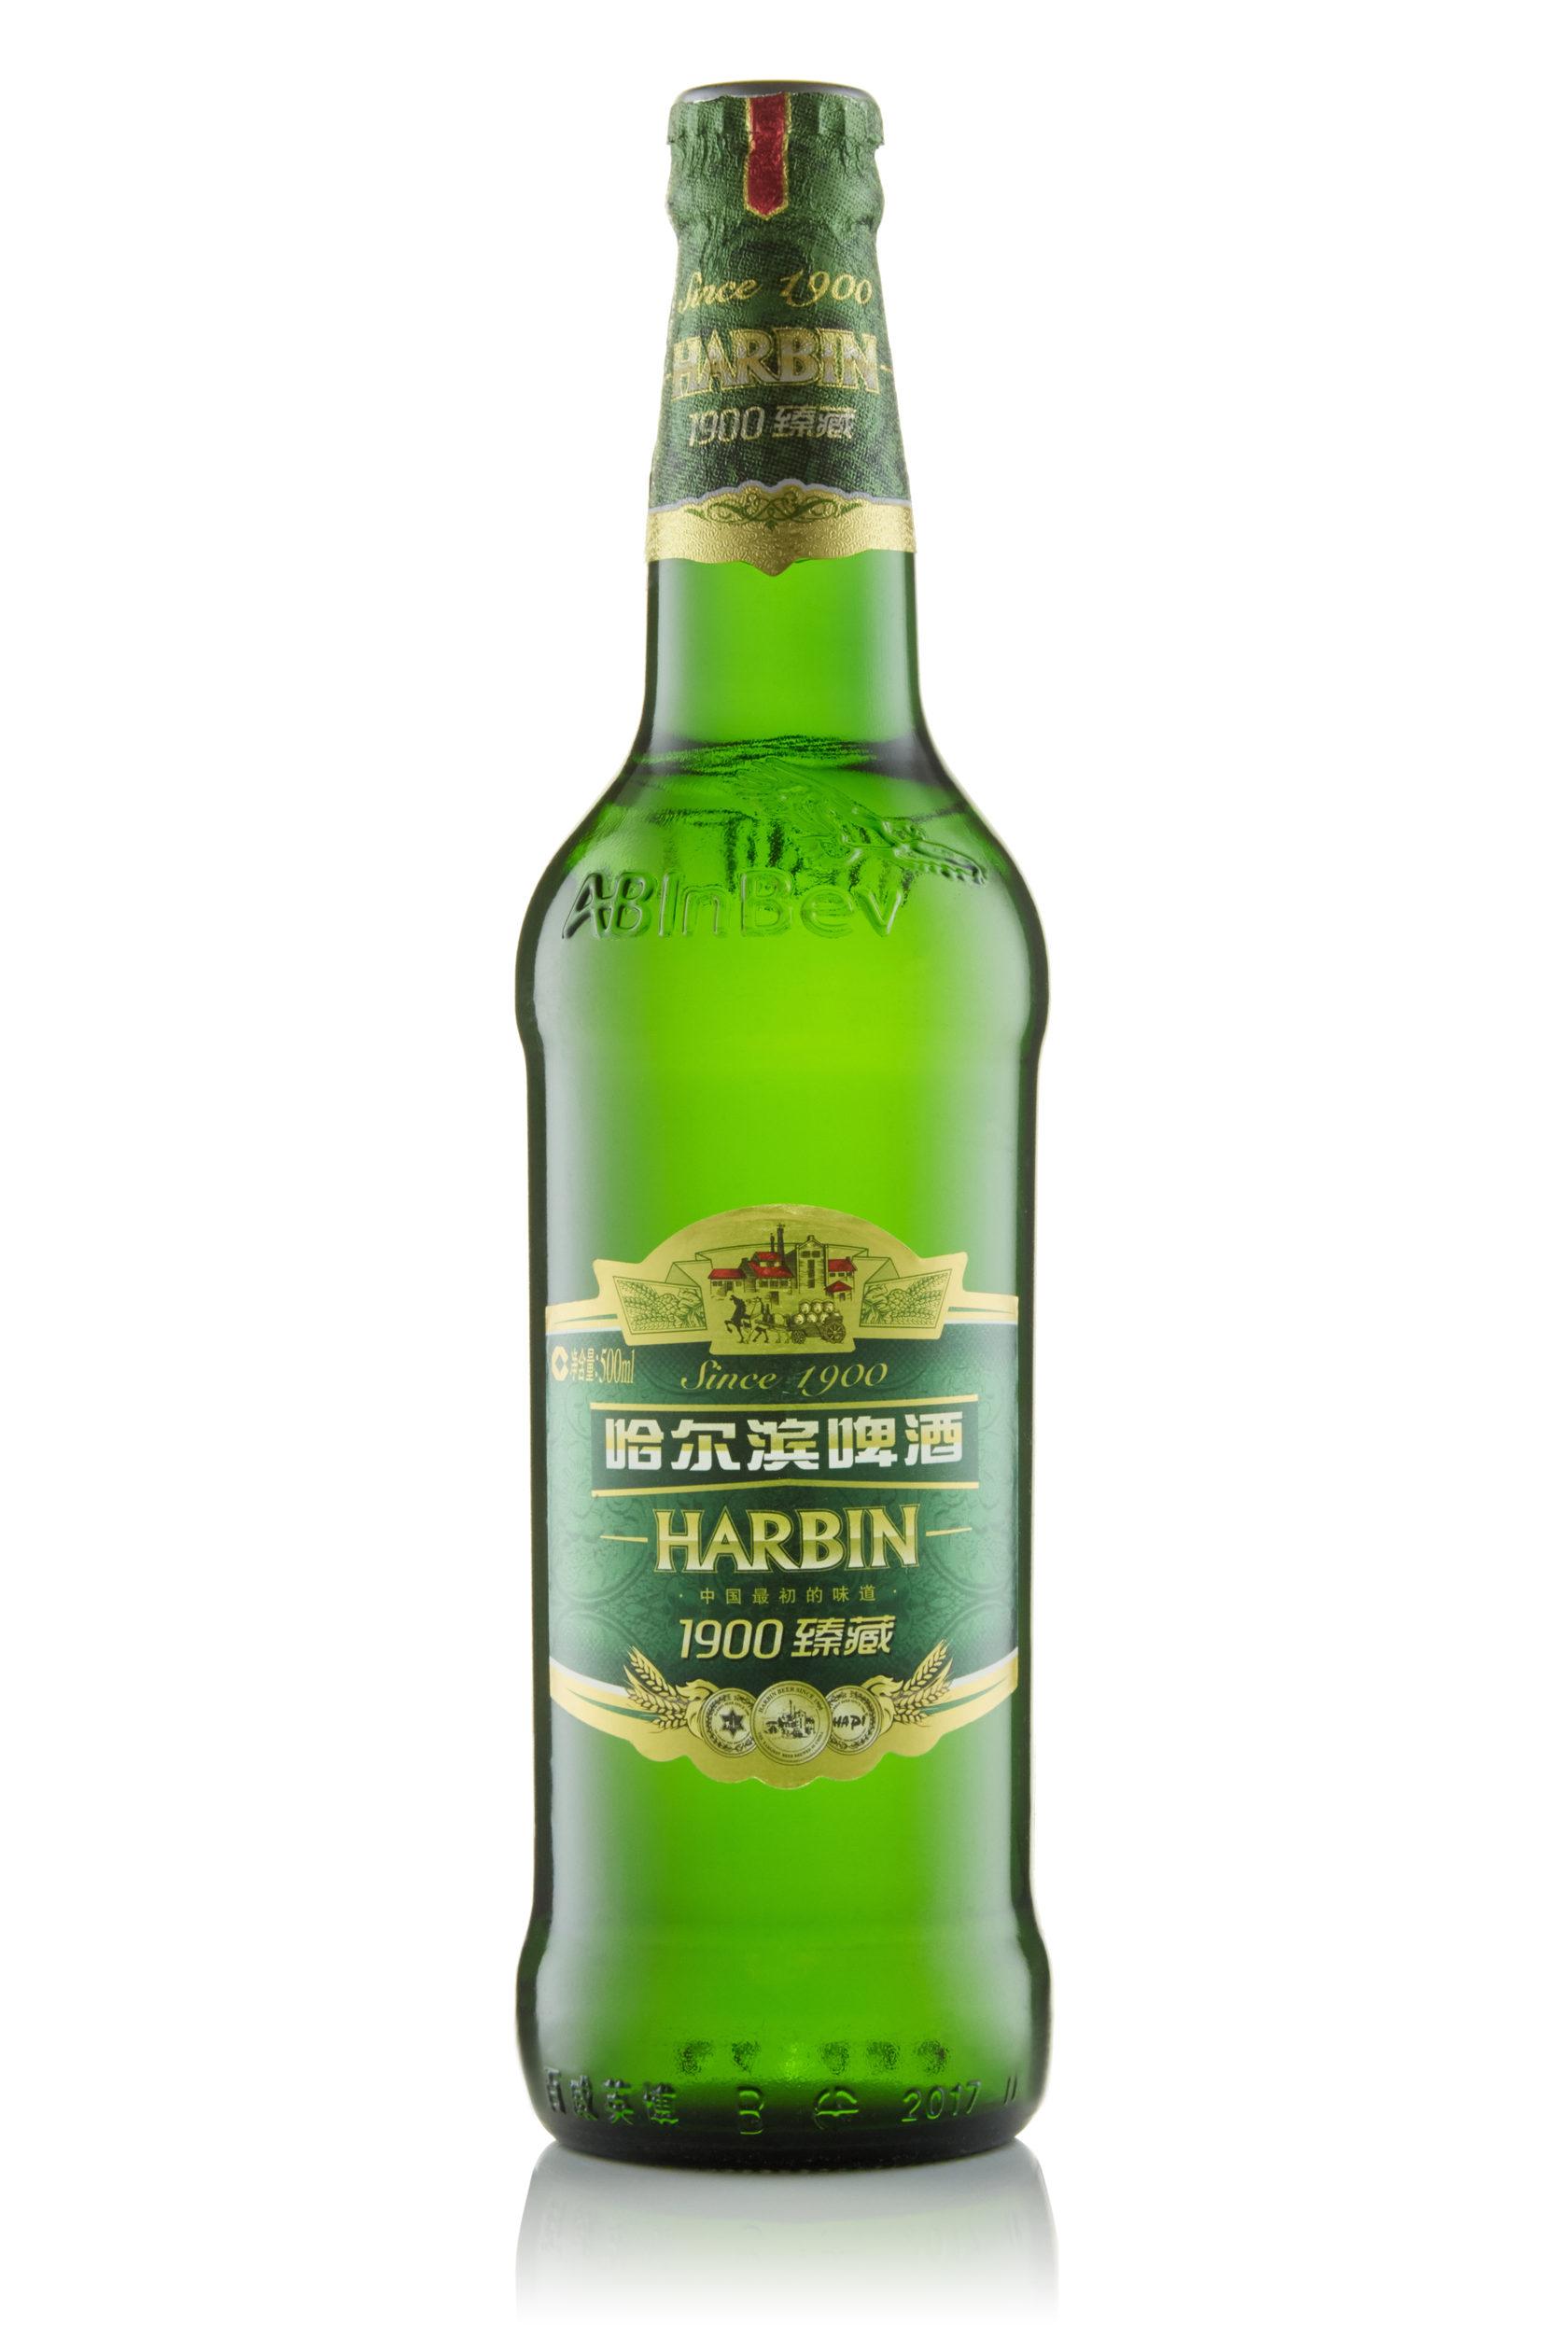 Купить пиво оптом Харбин 1900 500 мл ст/б